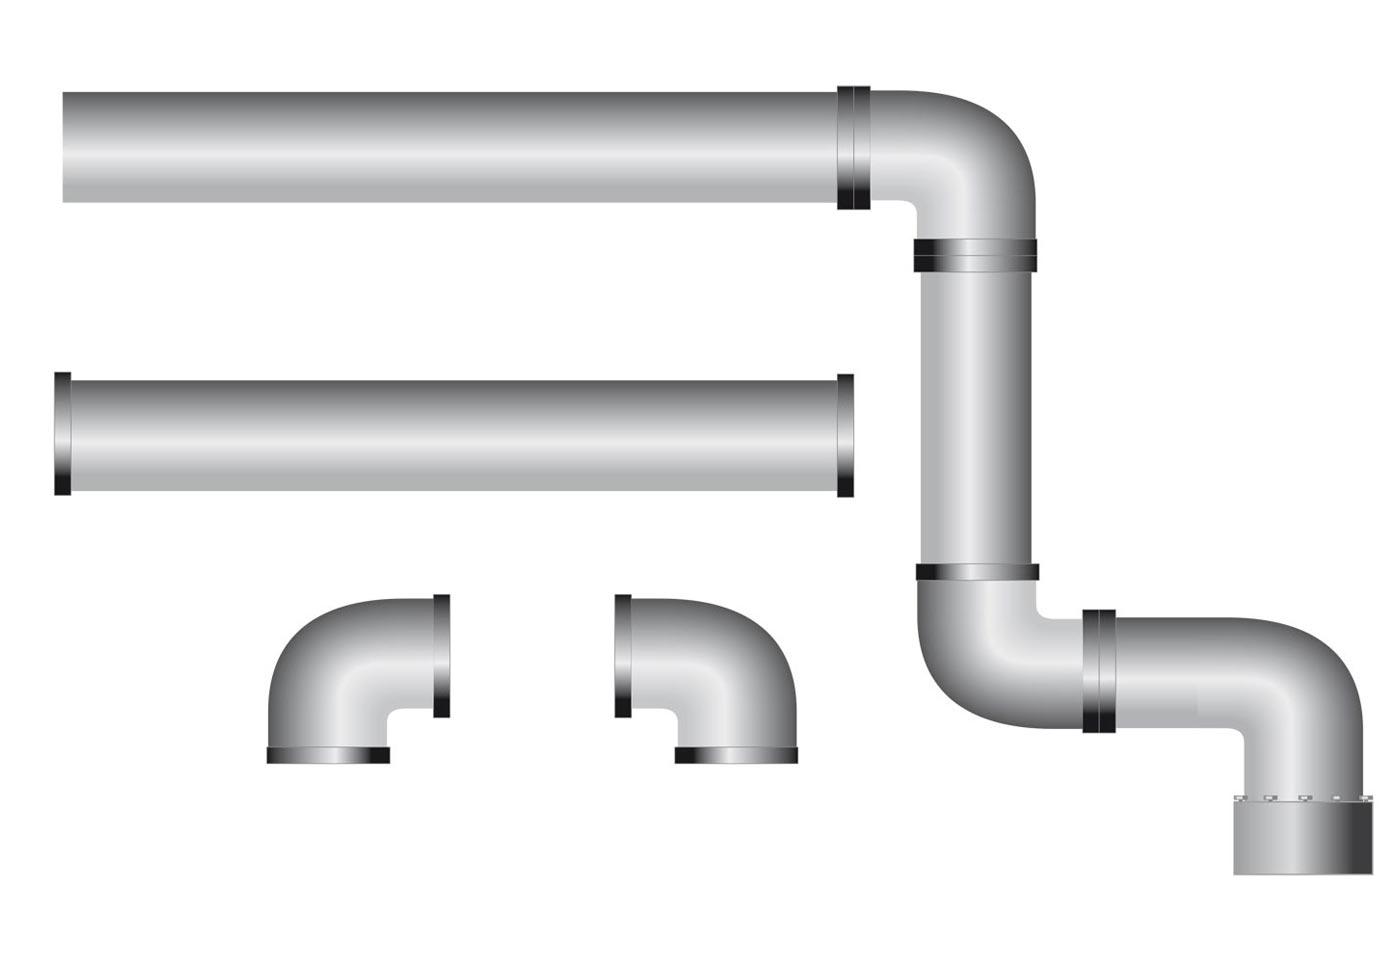 Water Pipe Free Vector Art.